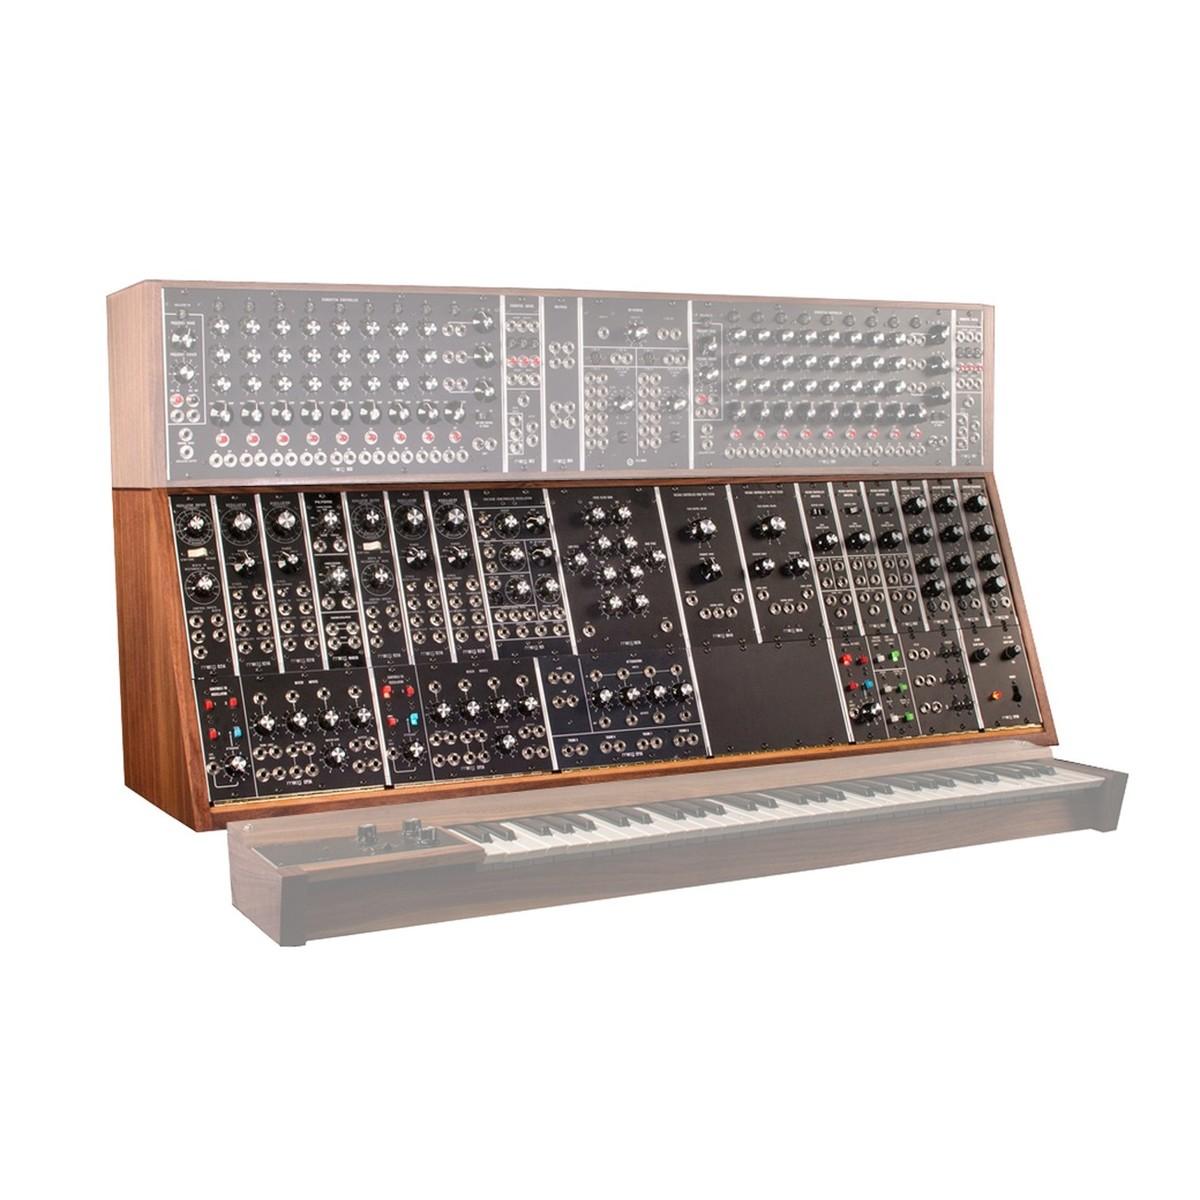 moog system 35 ltd edition modular synthesizer at gear4music. Black Bedroom Furniture Sets. Home Design Ideas